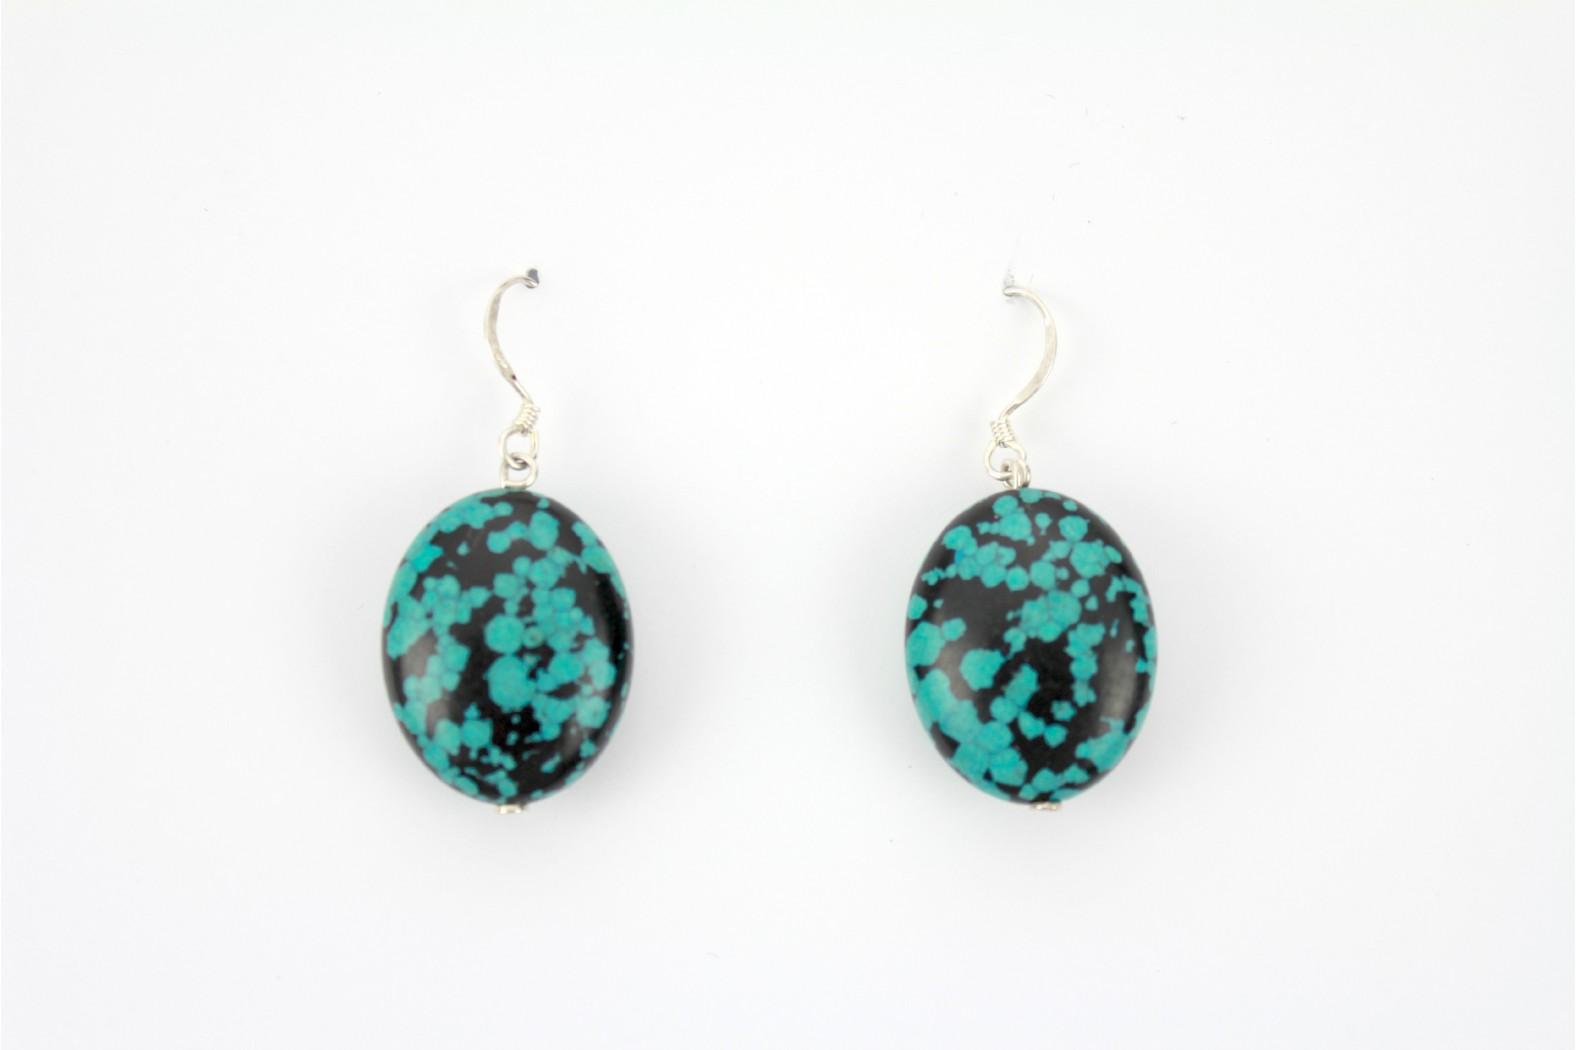 Medium Oval Turquoise polished stone Hand Made Individual design